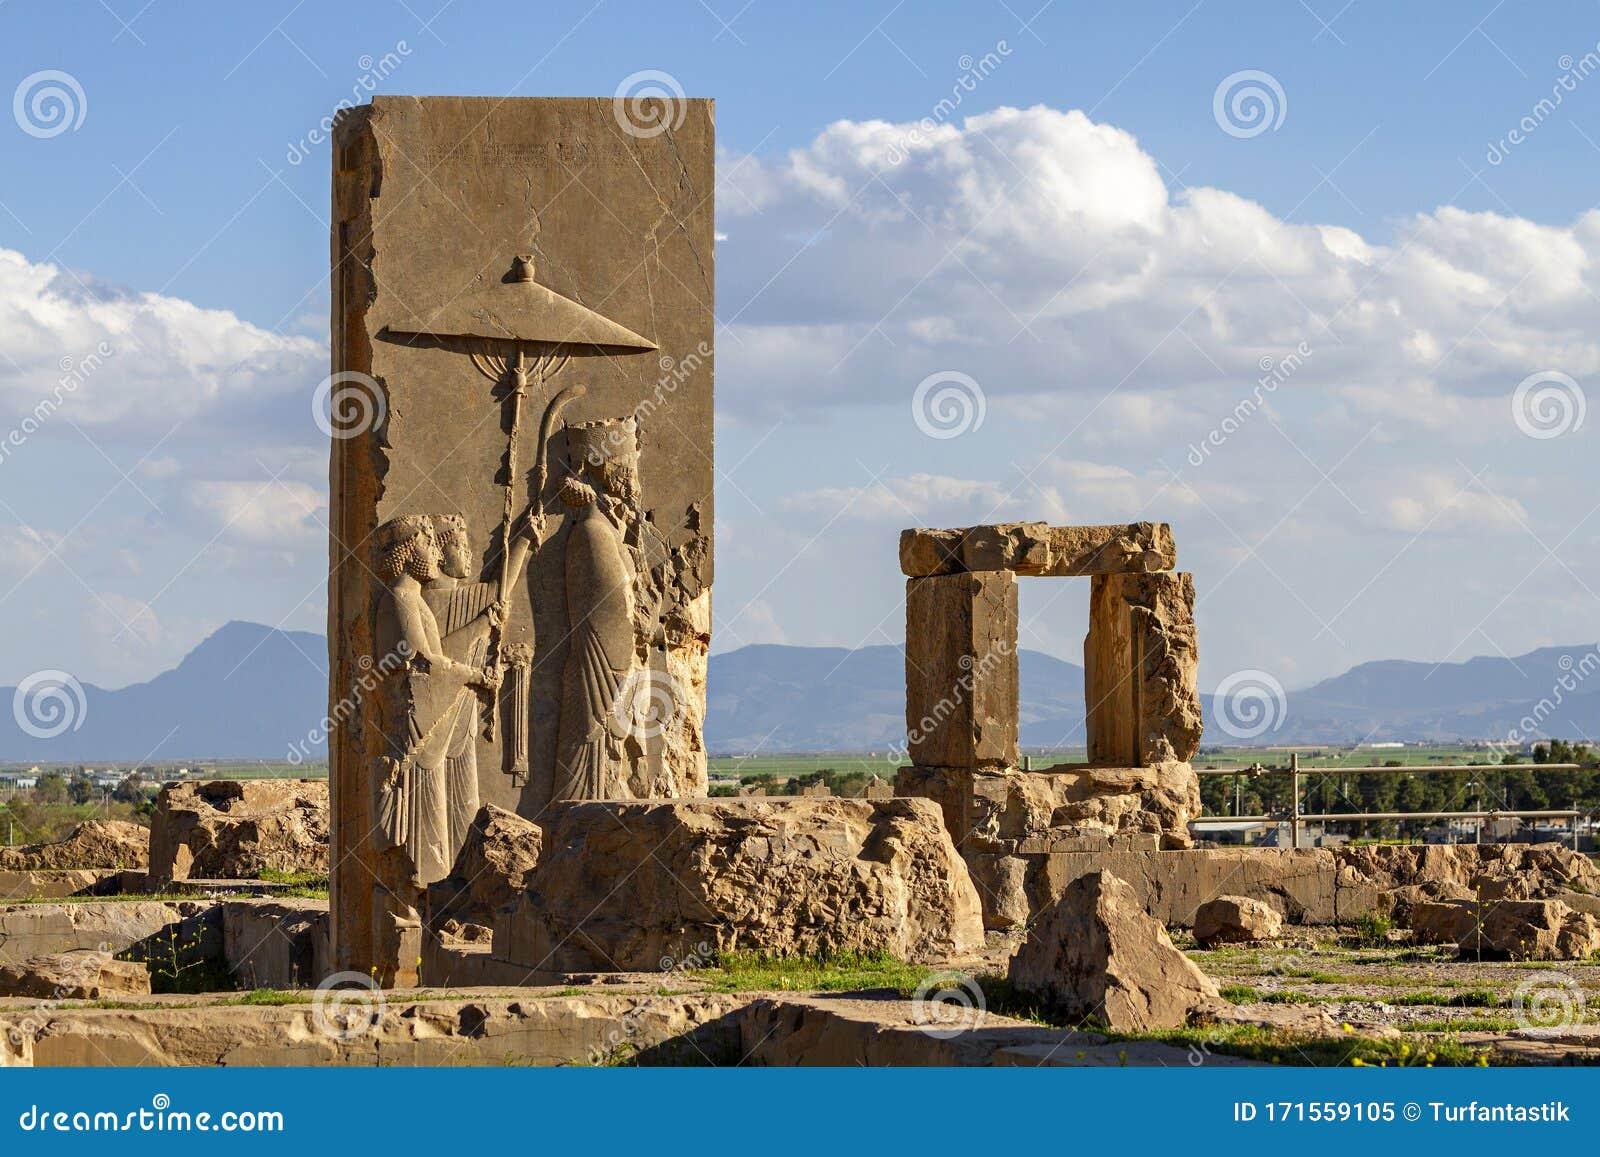 Ancient City Of Persepolis Shiraz Iran Stock Image Image Of Civilization Carving 171559105